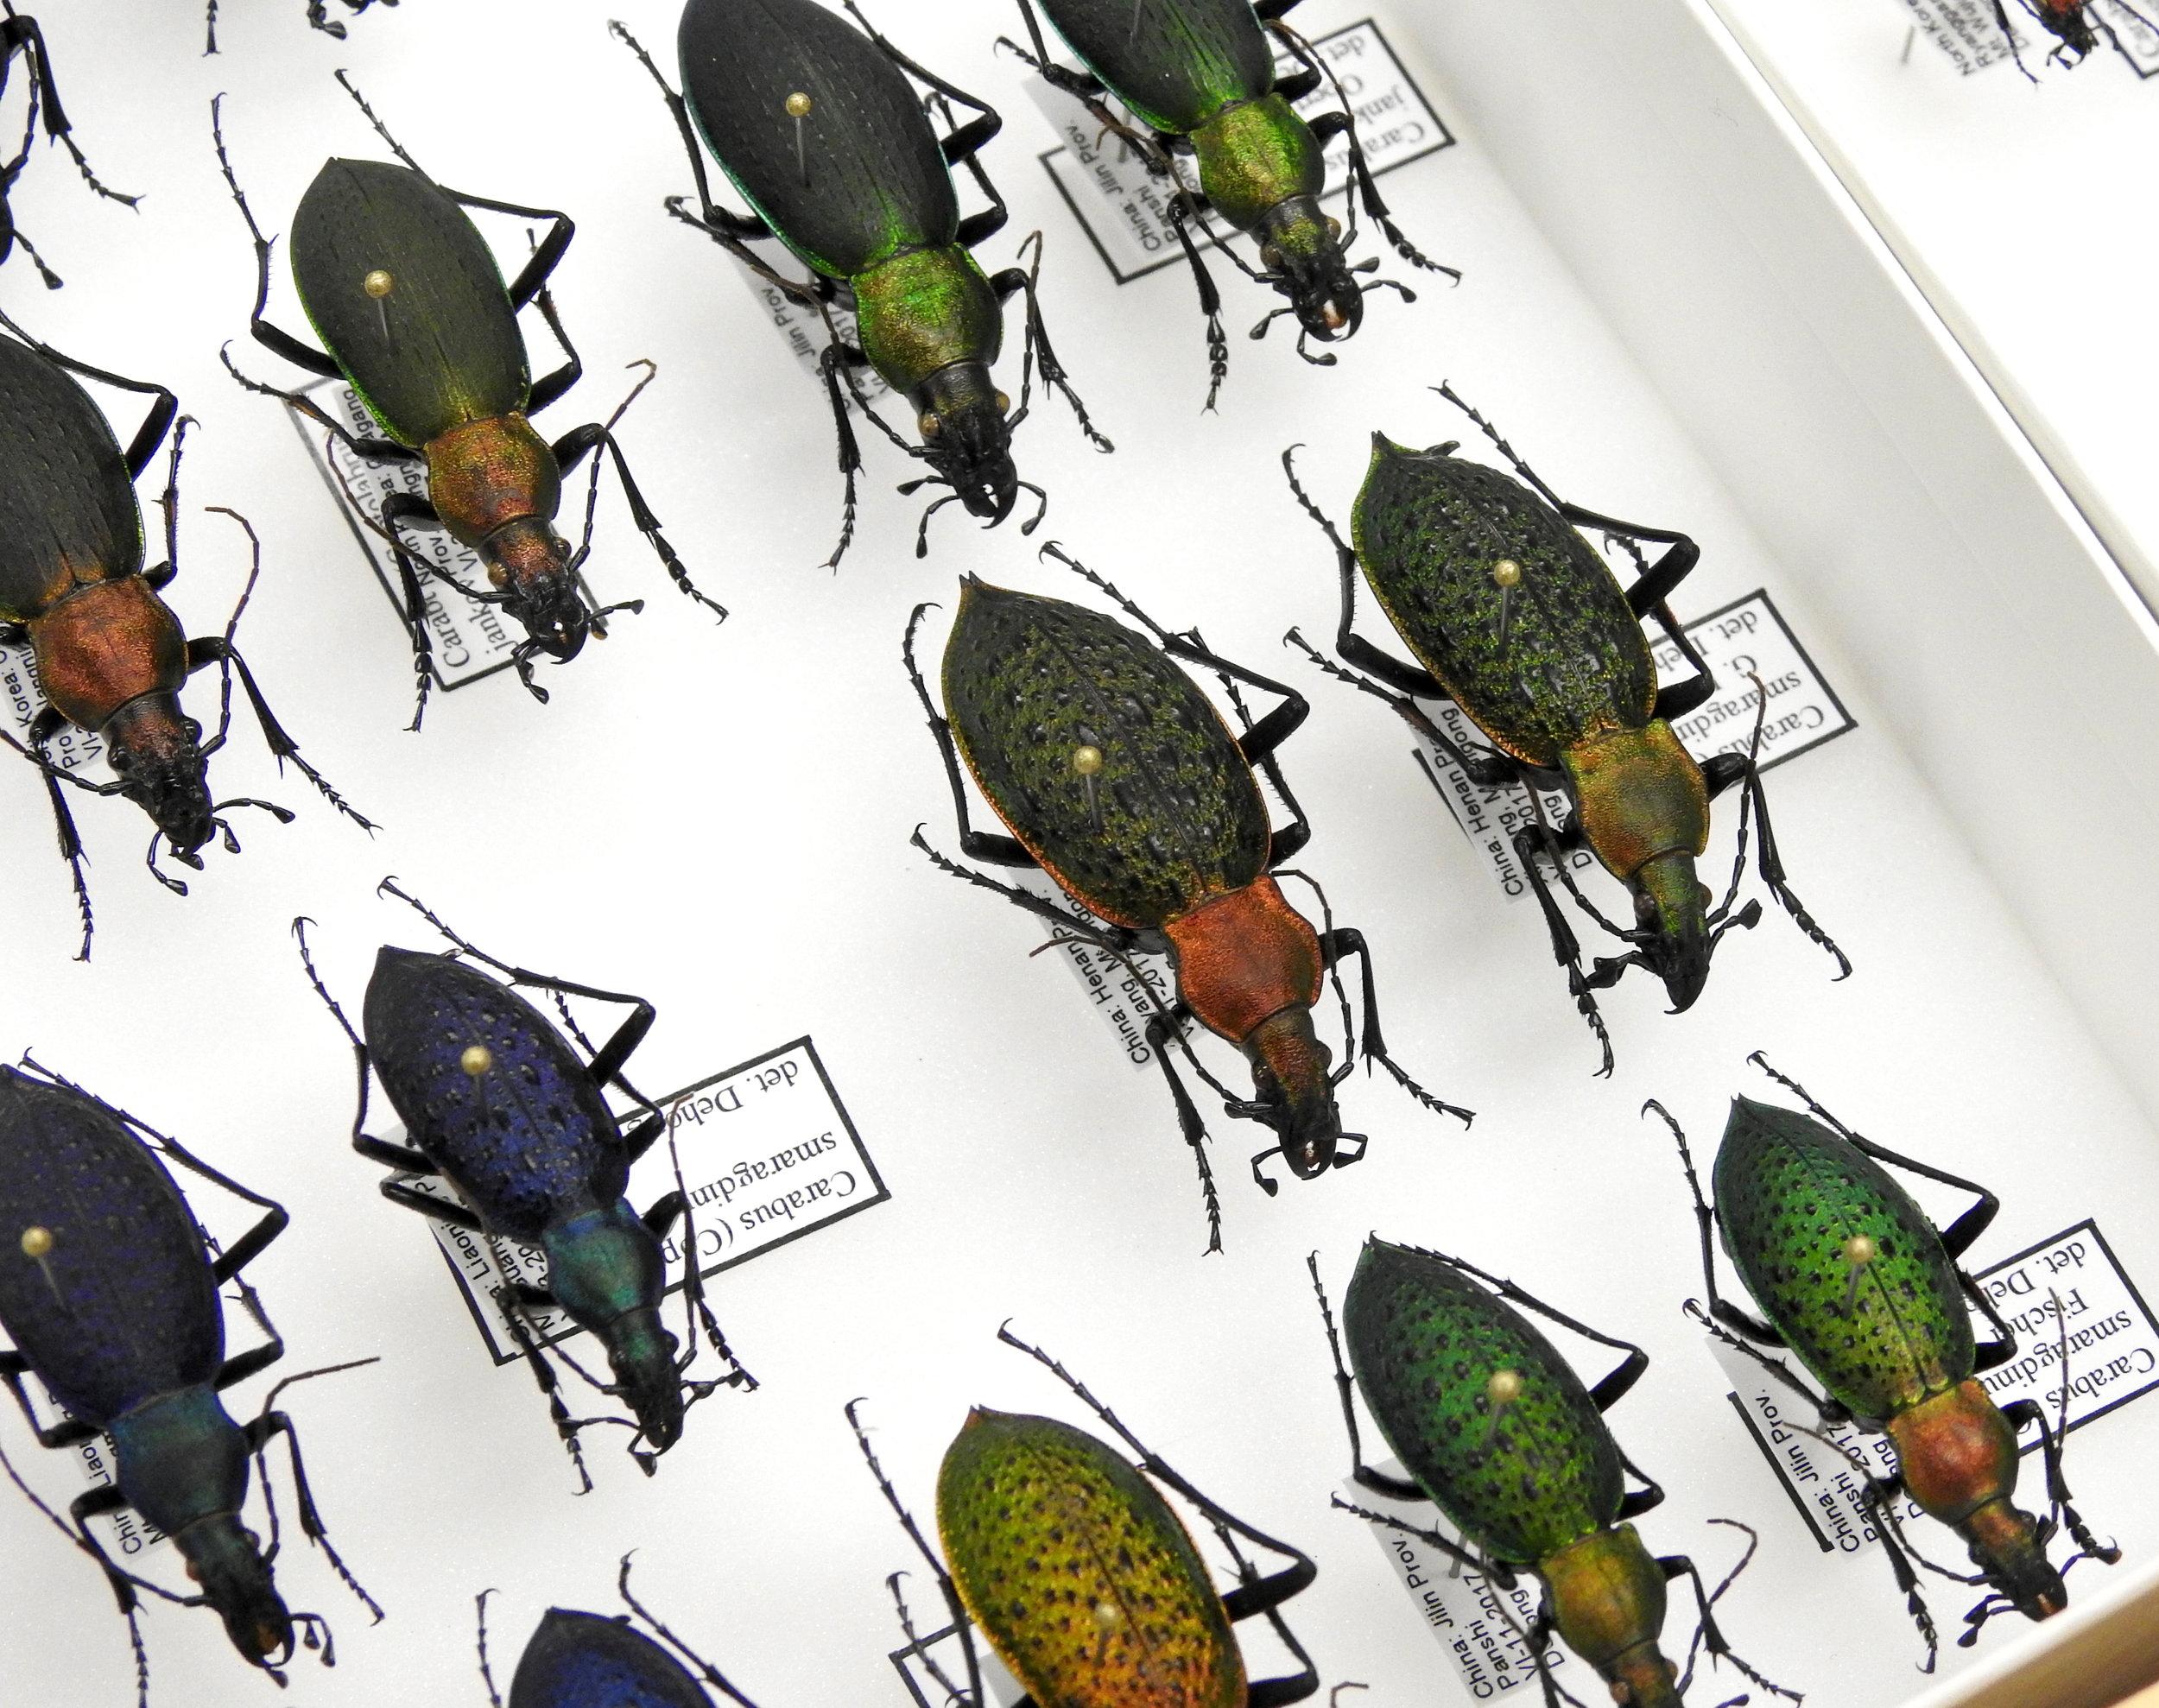 2018 Texas A&M Entomology Open House - Texas A&M University, College Station, TXJanuary 6, 2018